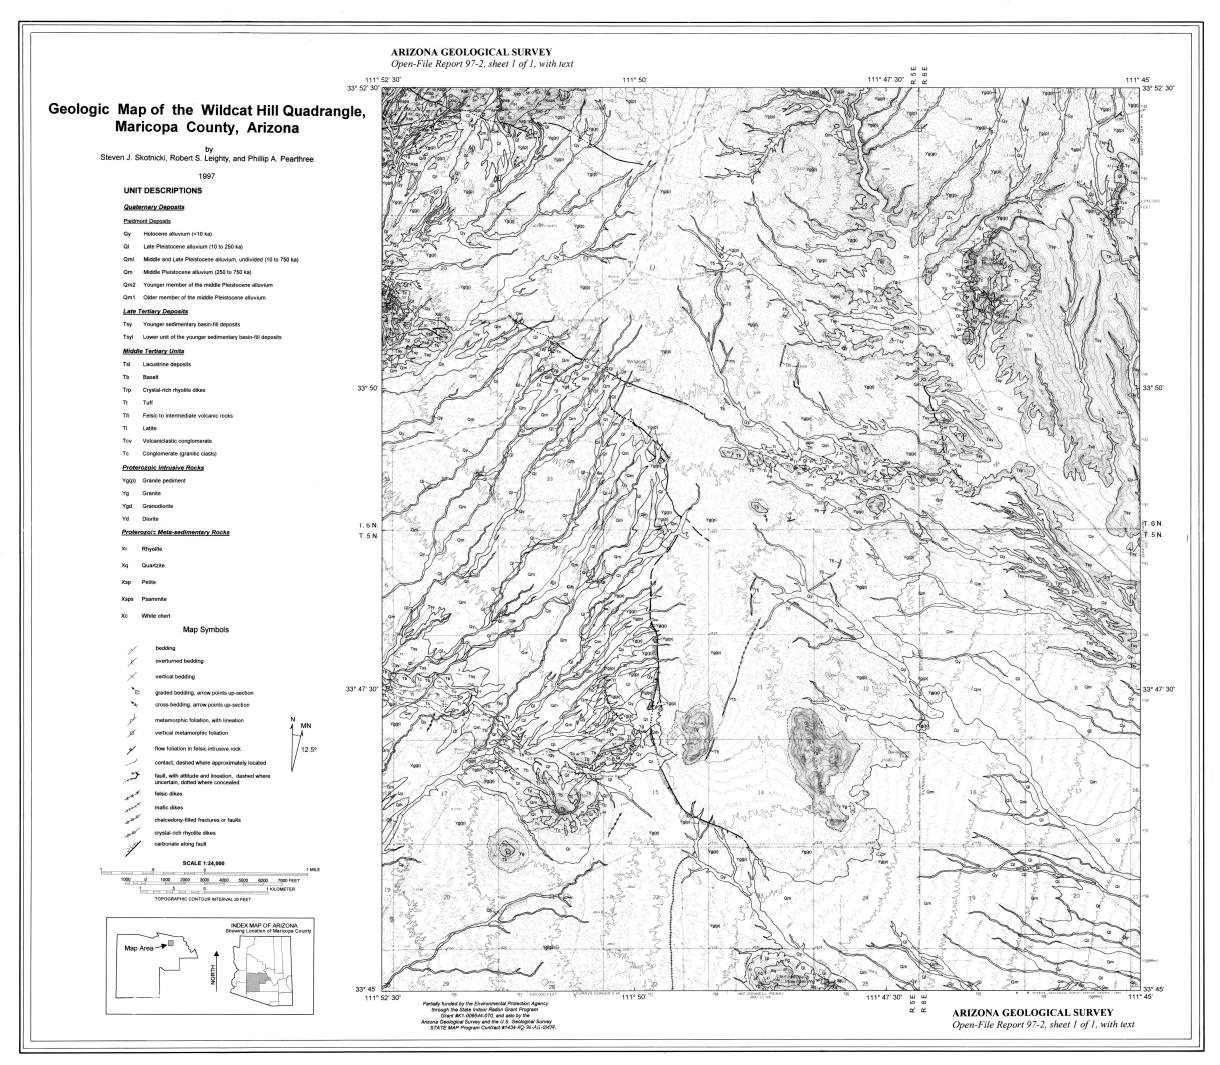 Thumbnail image of document cover: Geologic Map of the Wildcat Hill Quadrangle, Maricopa County, Arizona